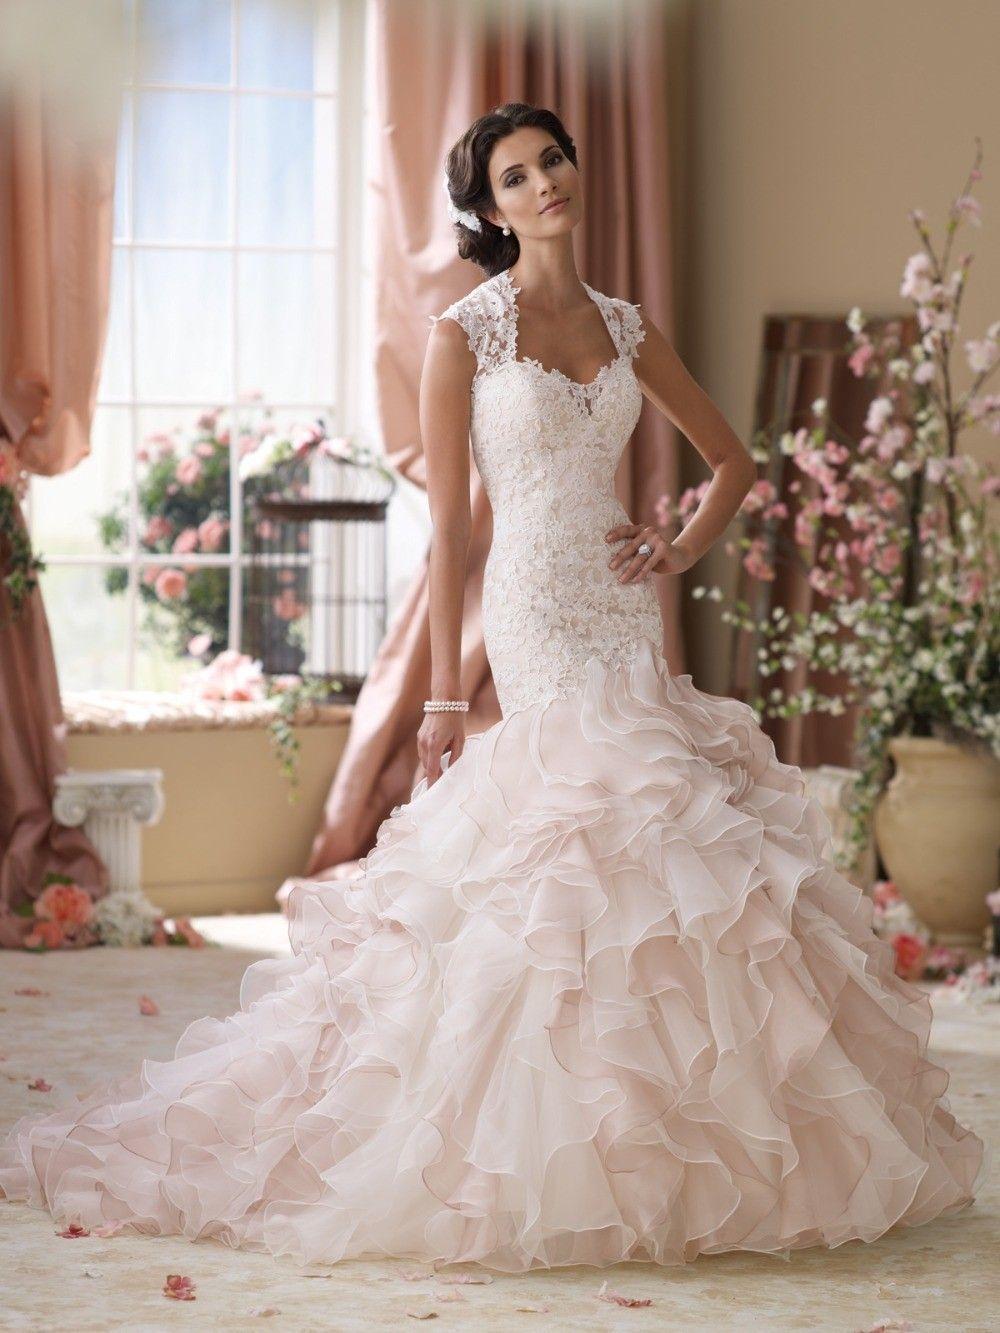 Mermaid ruffle wedding dress  Custom Made  New Blush Pink Sweetheart Organza Ruffle Wedding